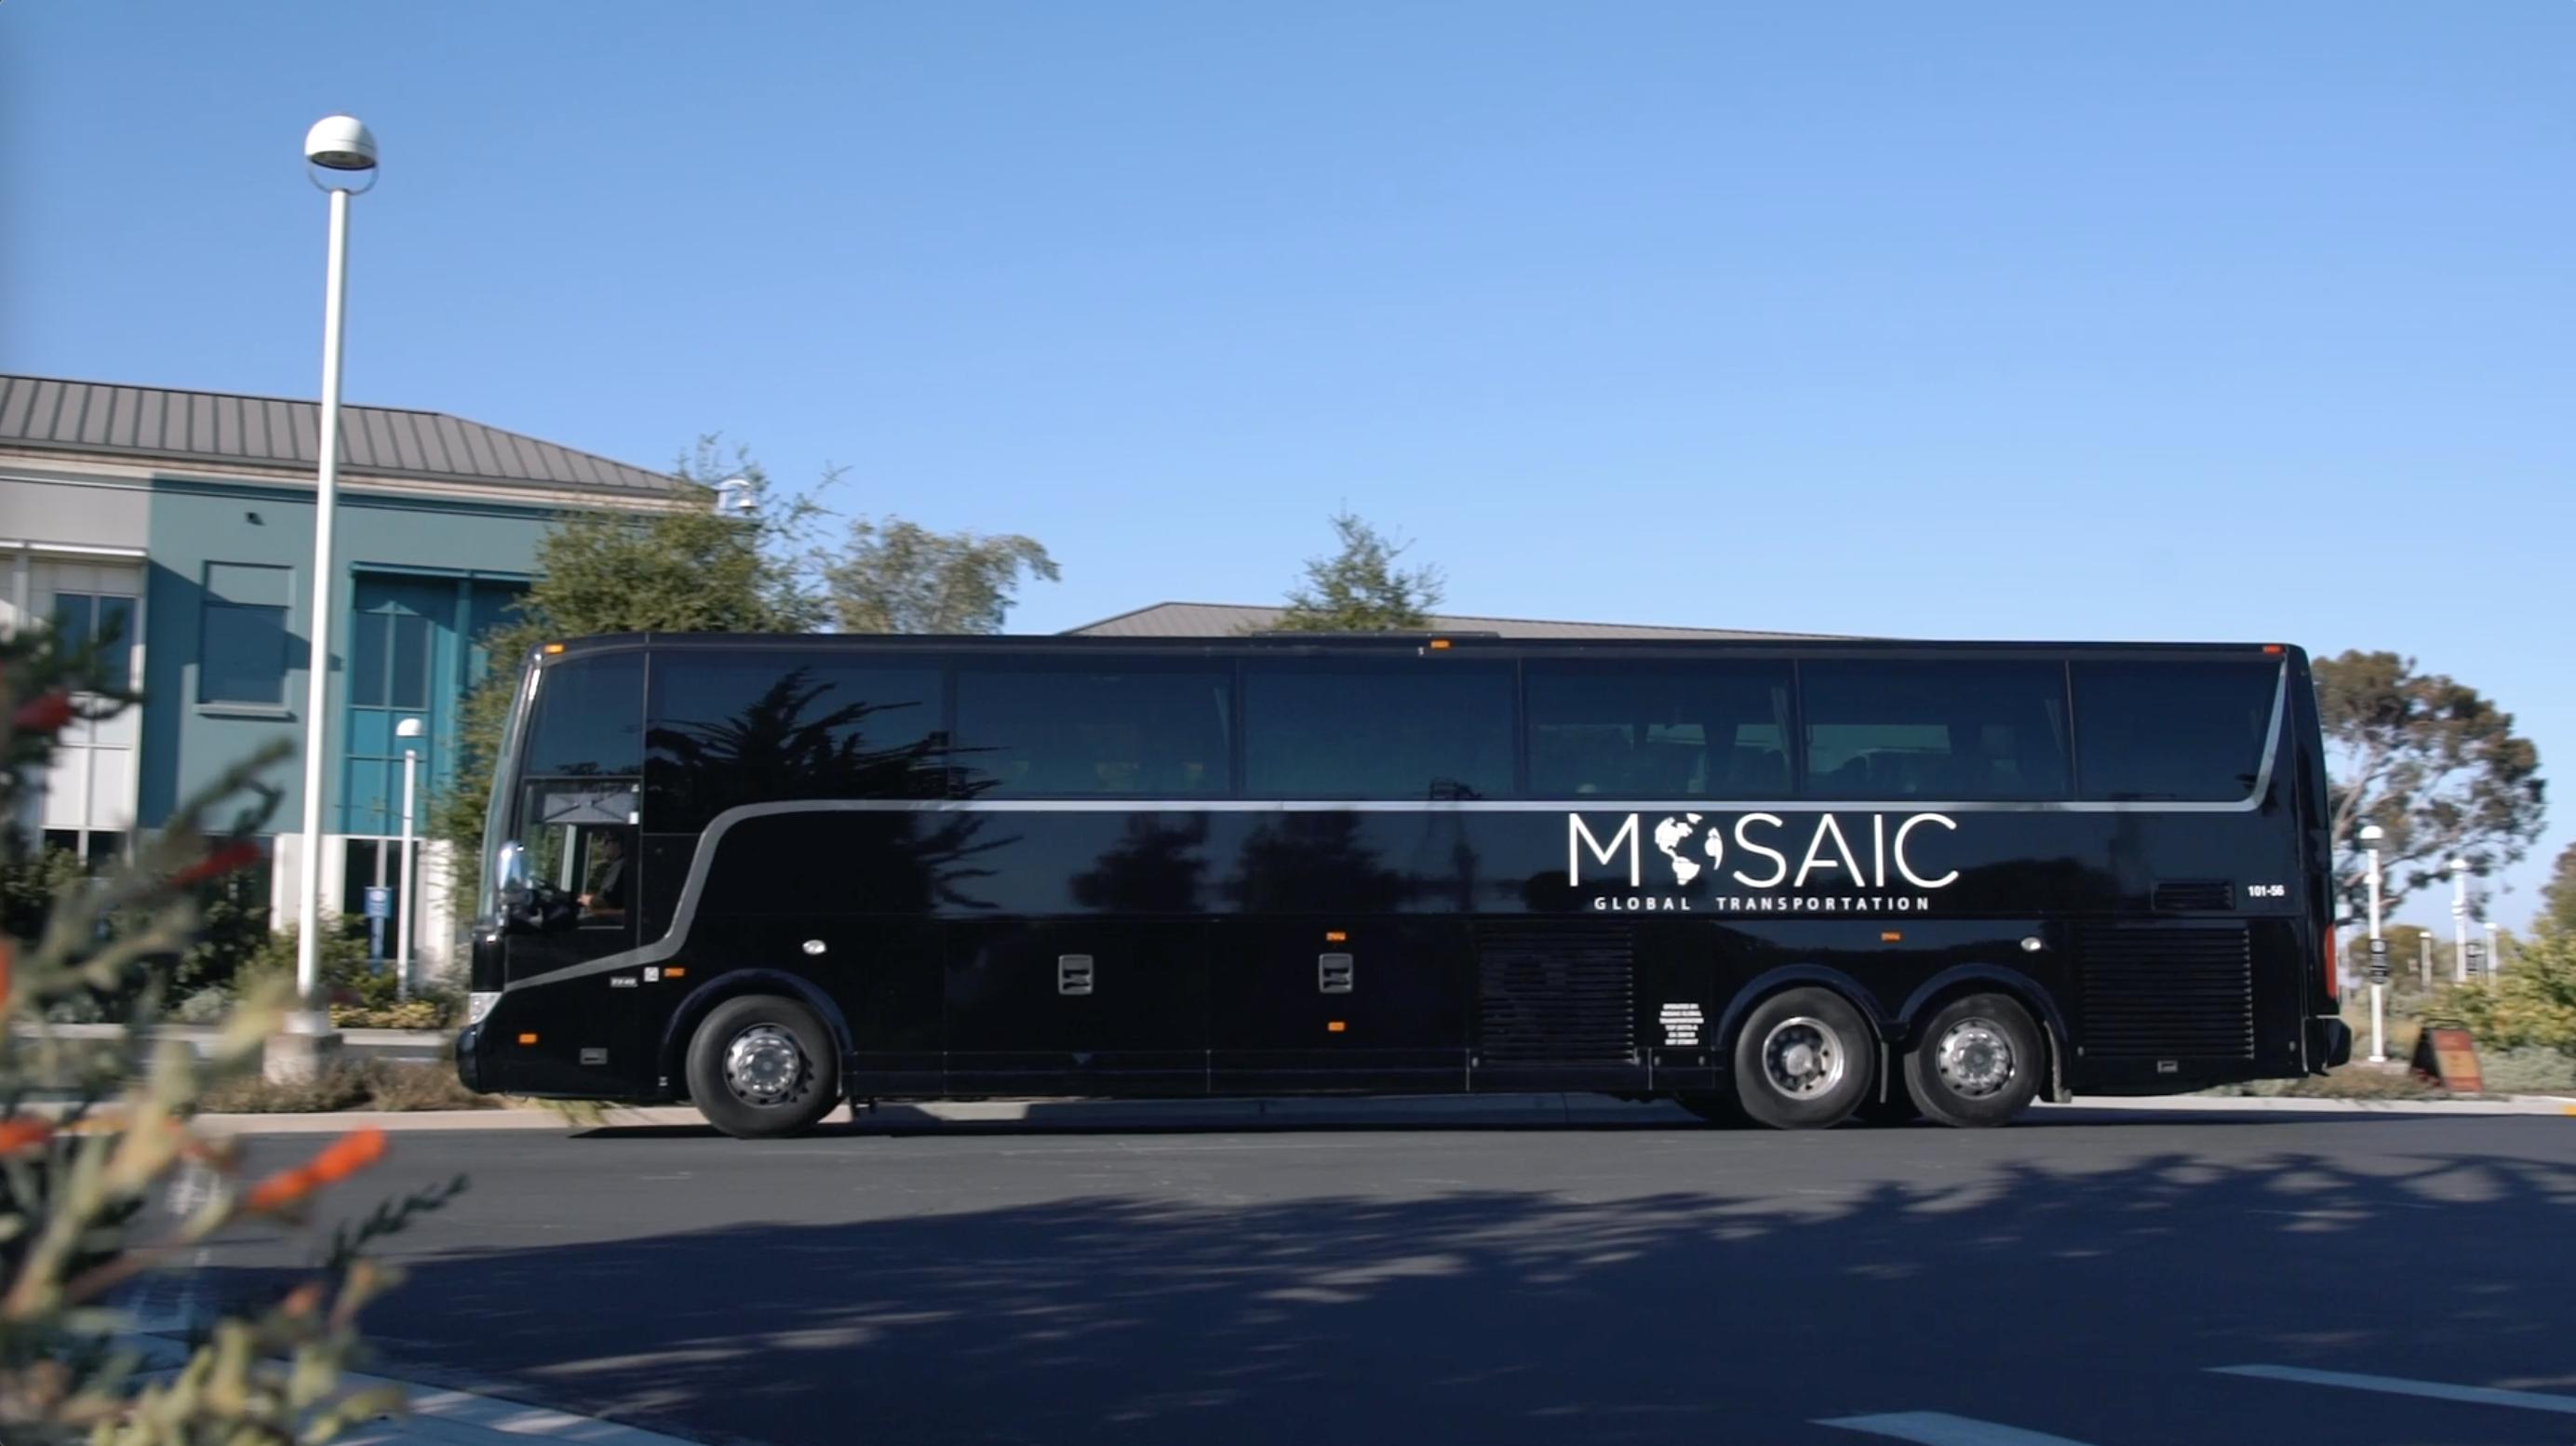 Large black shuttle bus parked on street